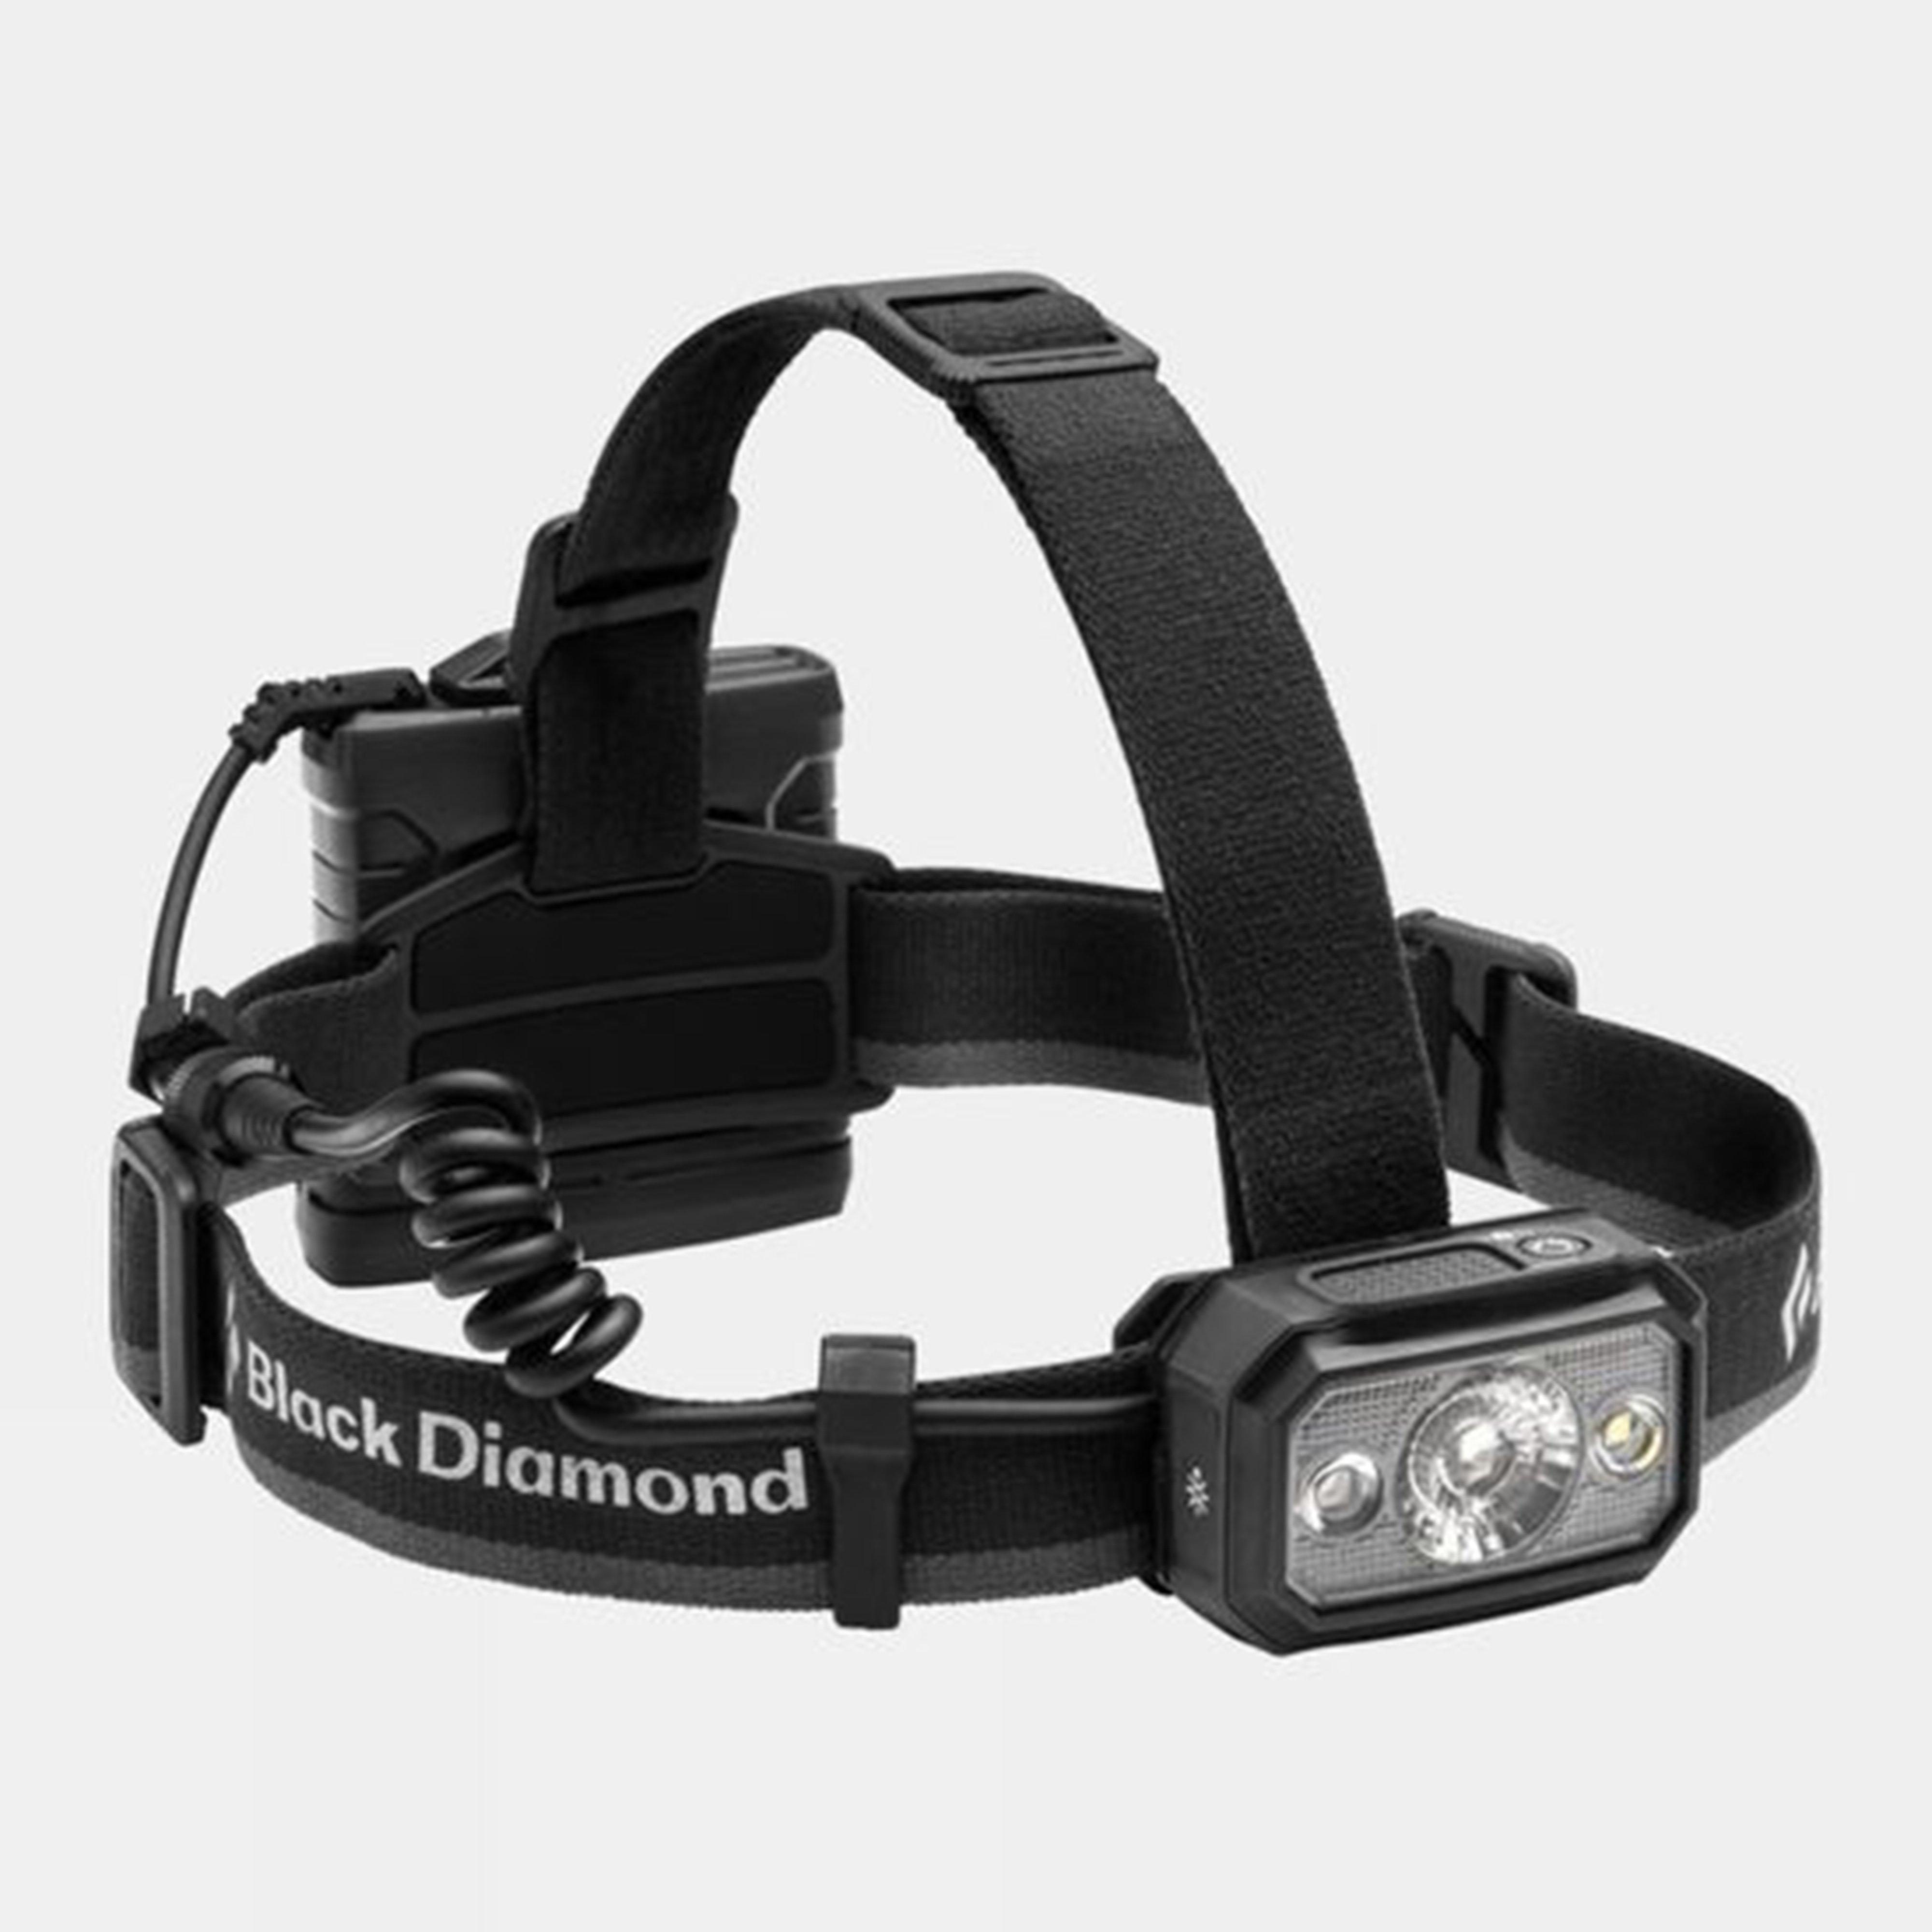 Black Diamond Icon 700 Headlamp - Blk/blk  Blk/blk